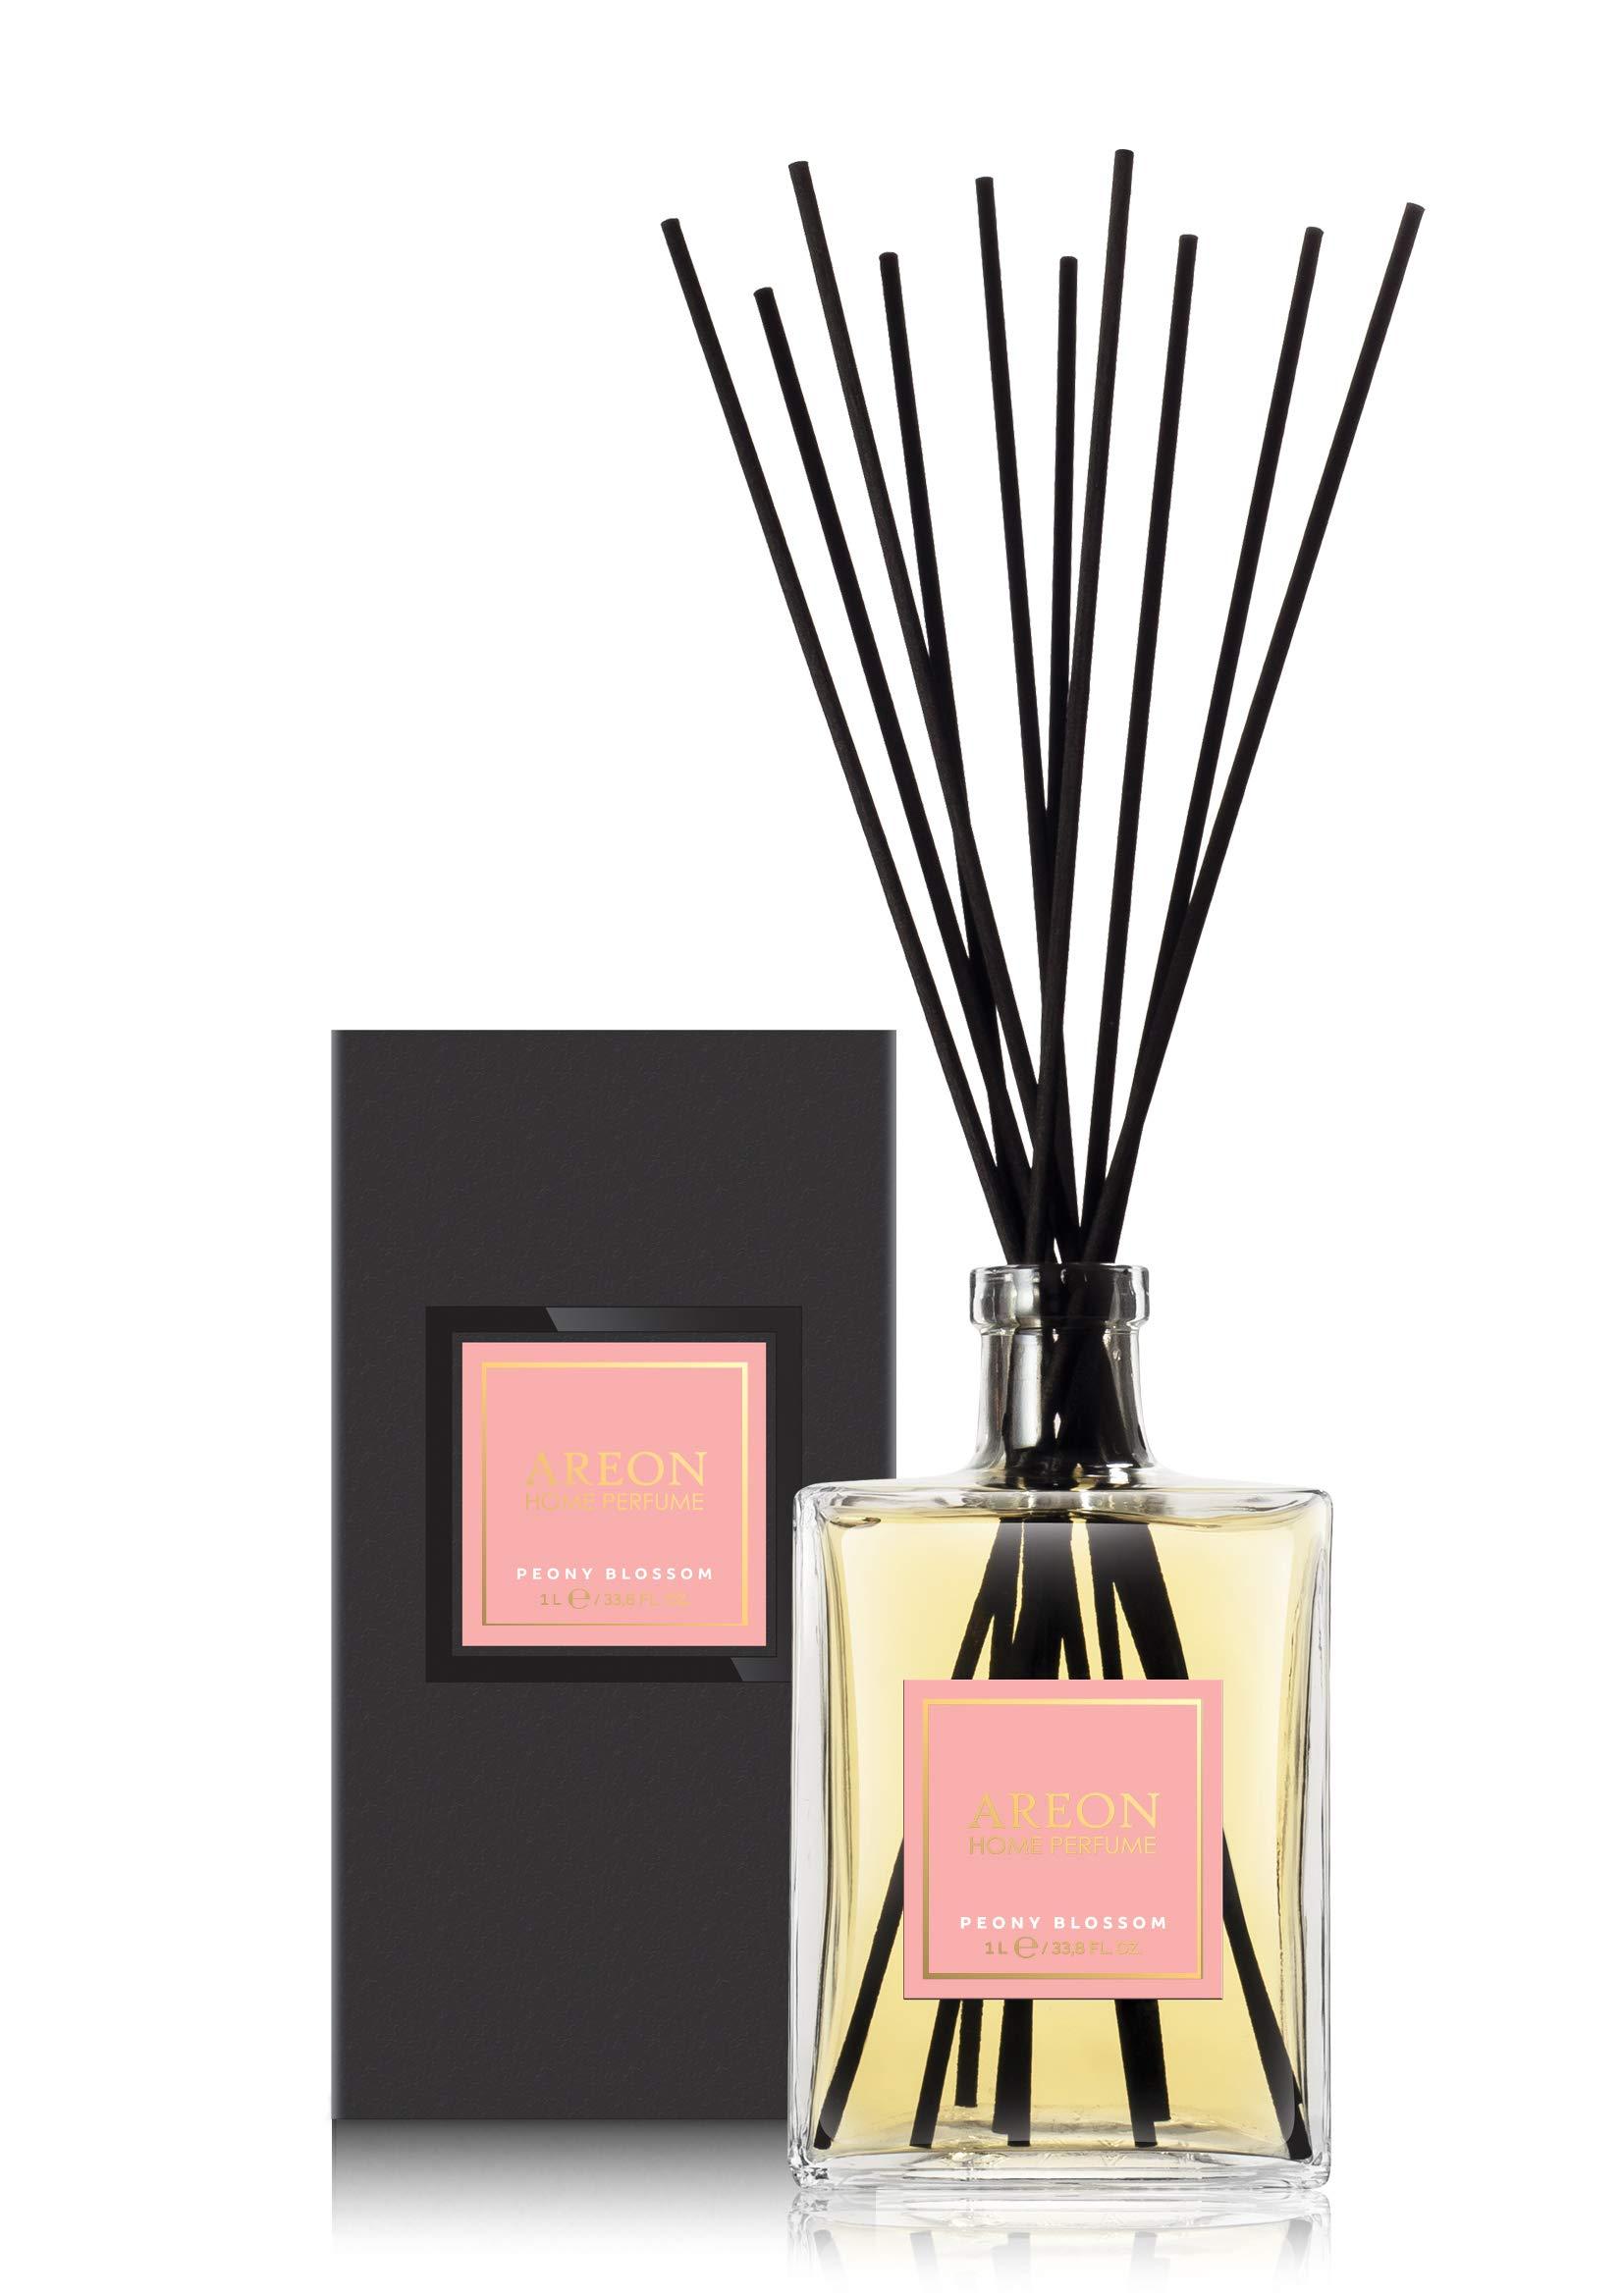 Areon Home Perfume Sticks - 1 Liter (34 OZ) Peoni Blossom